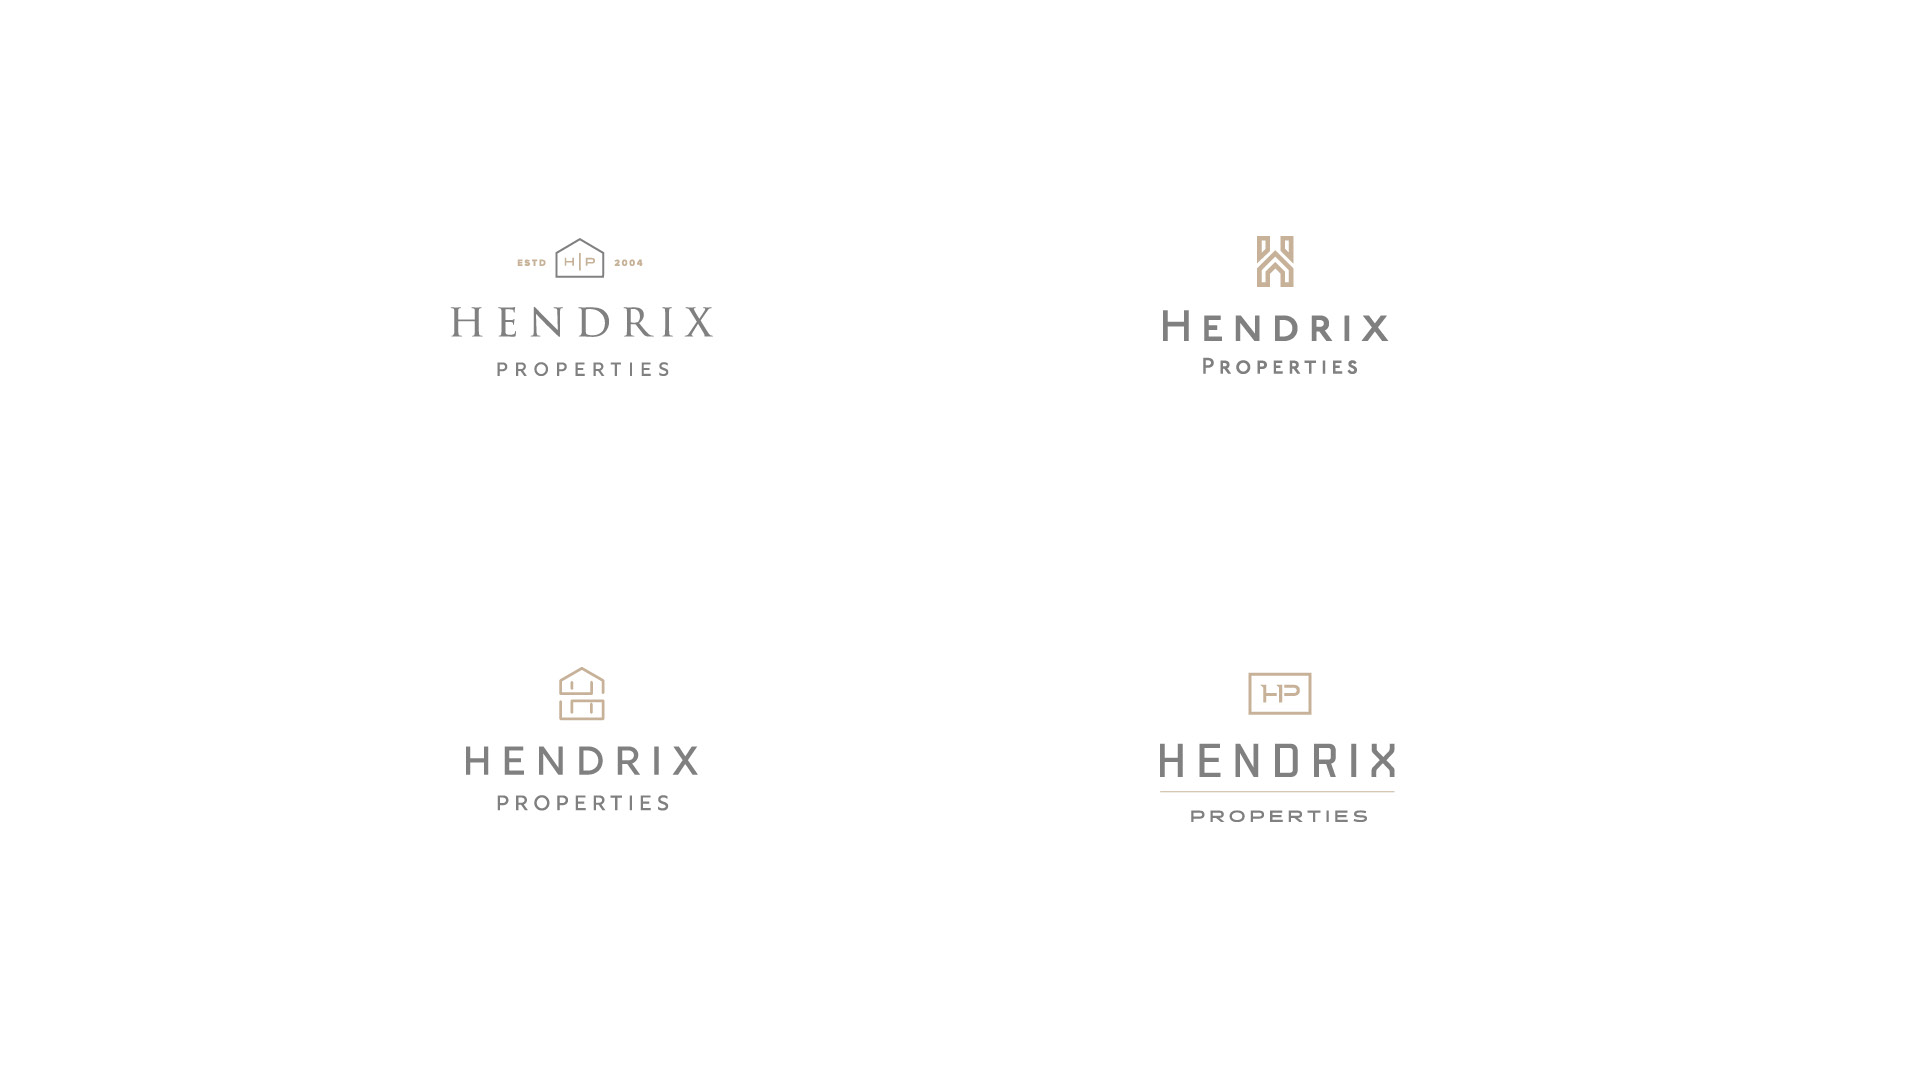 Hendrix Branding Project7.jpg